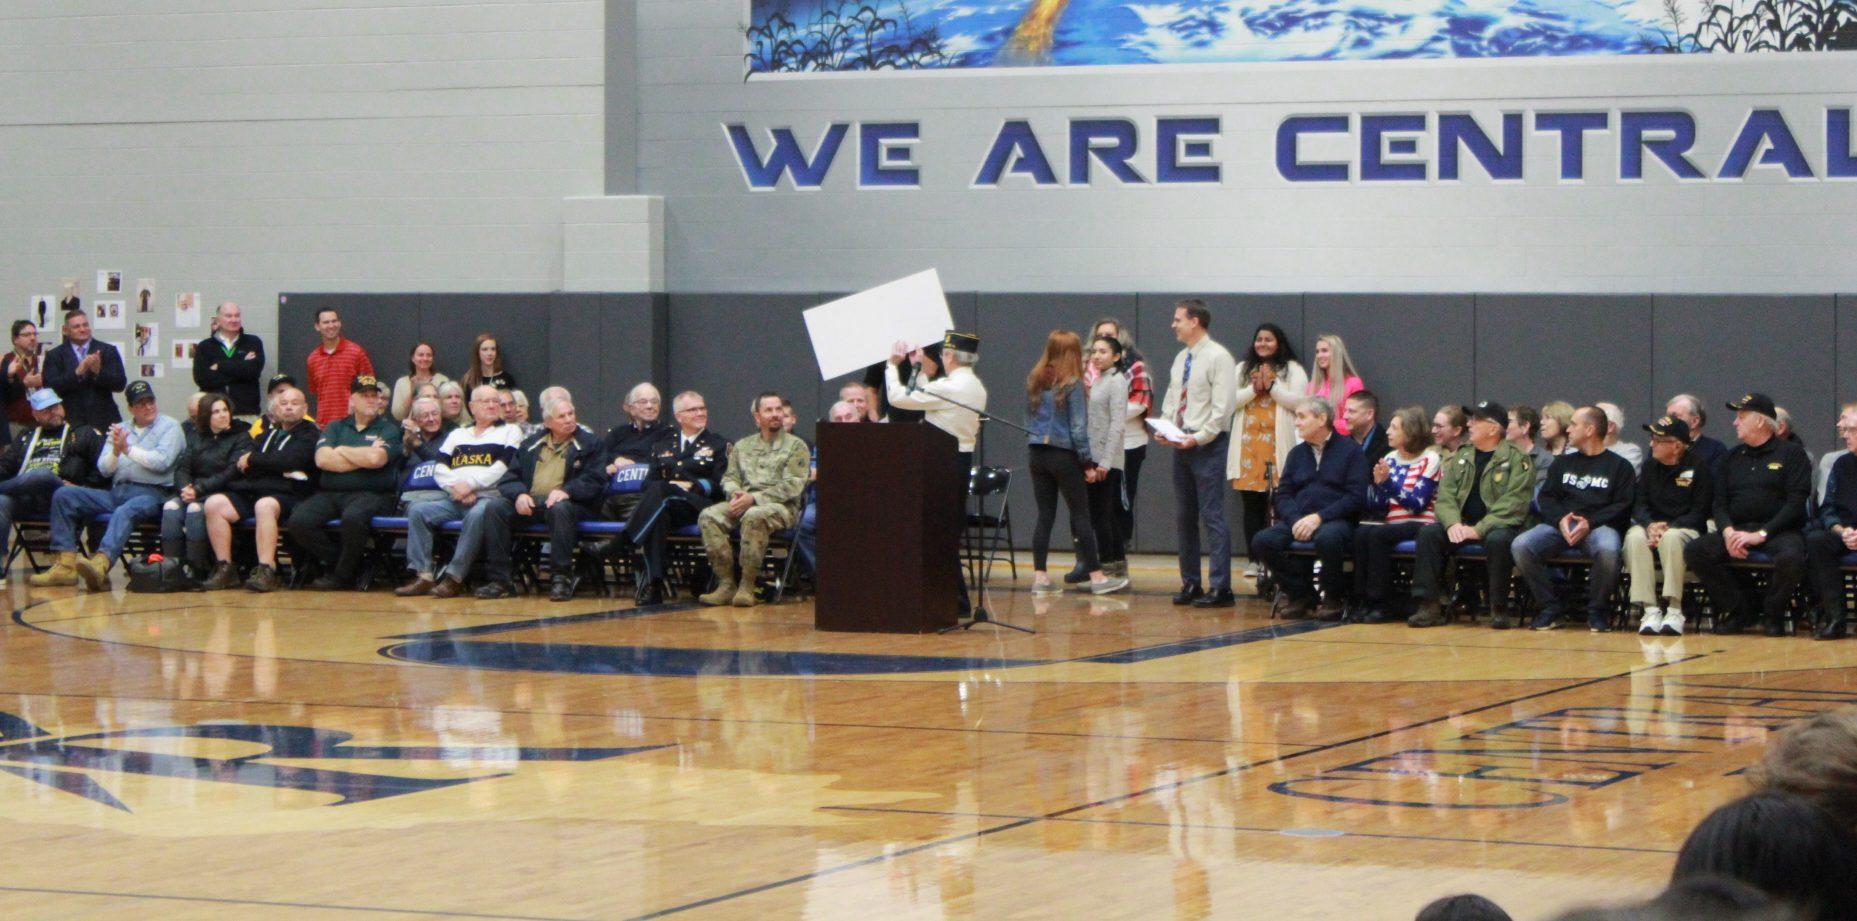 Veterans in attendance at Veterans Day assembly